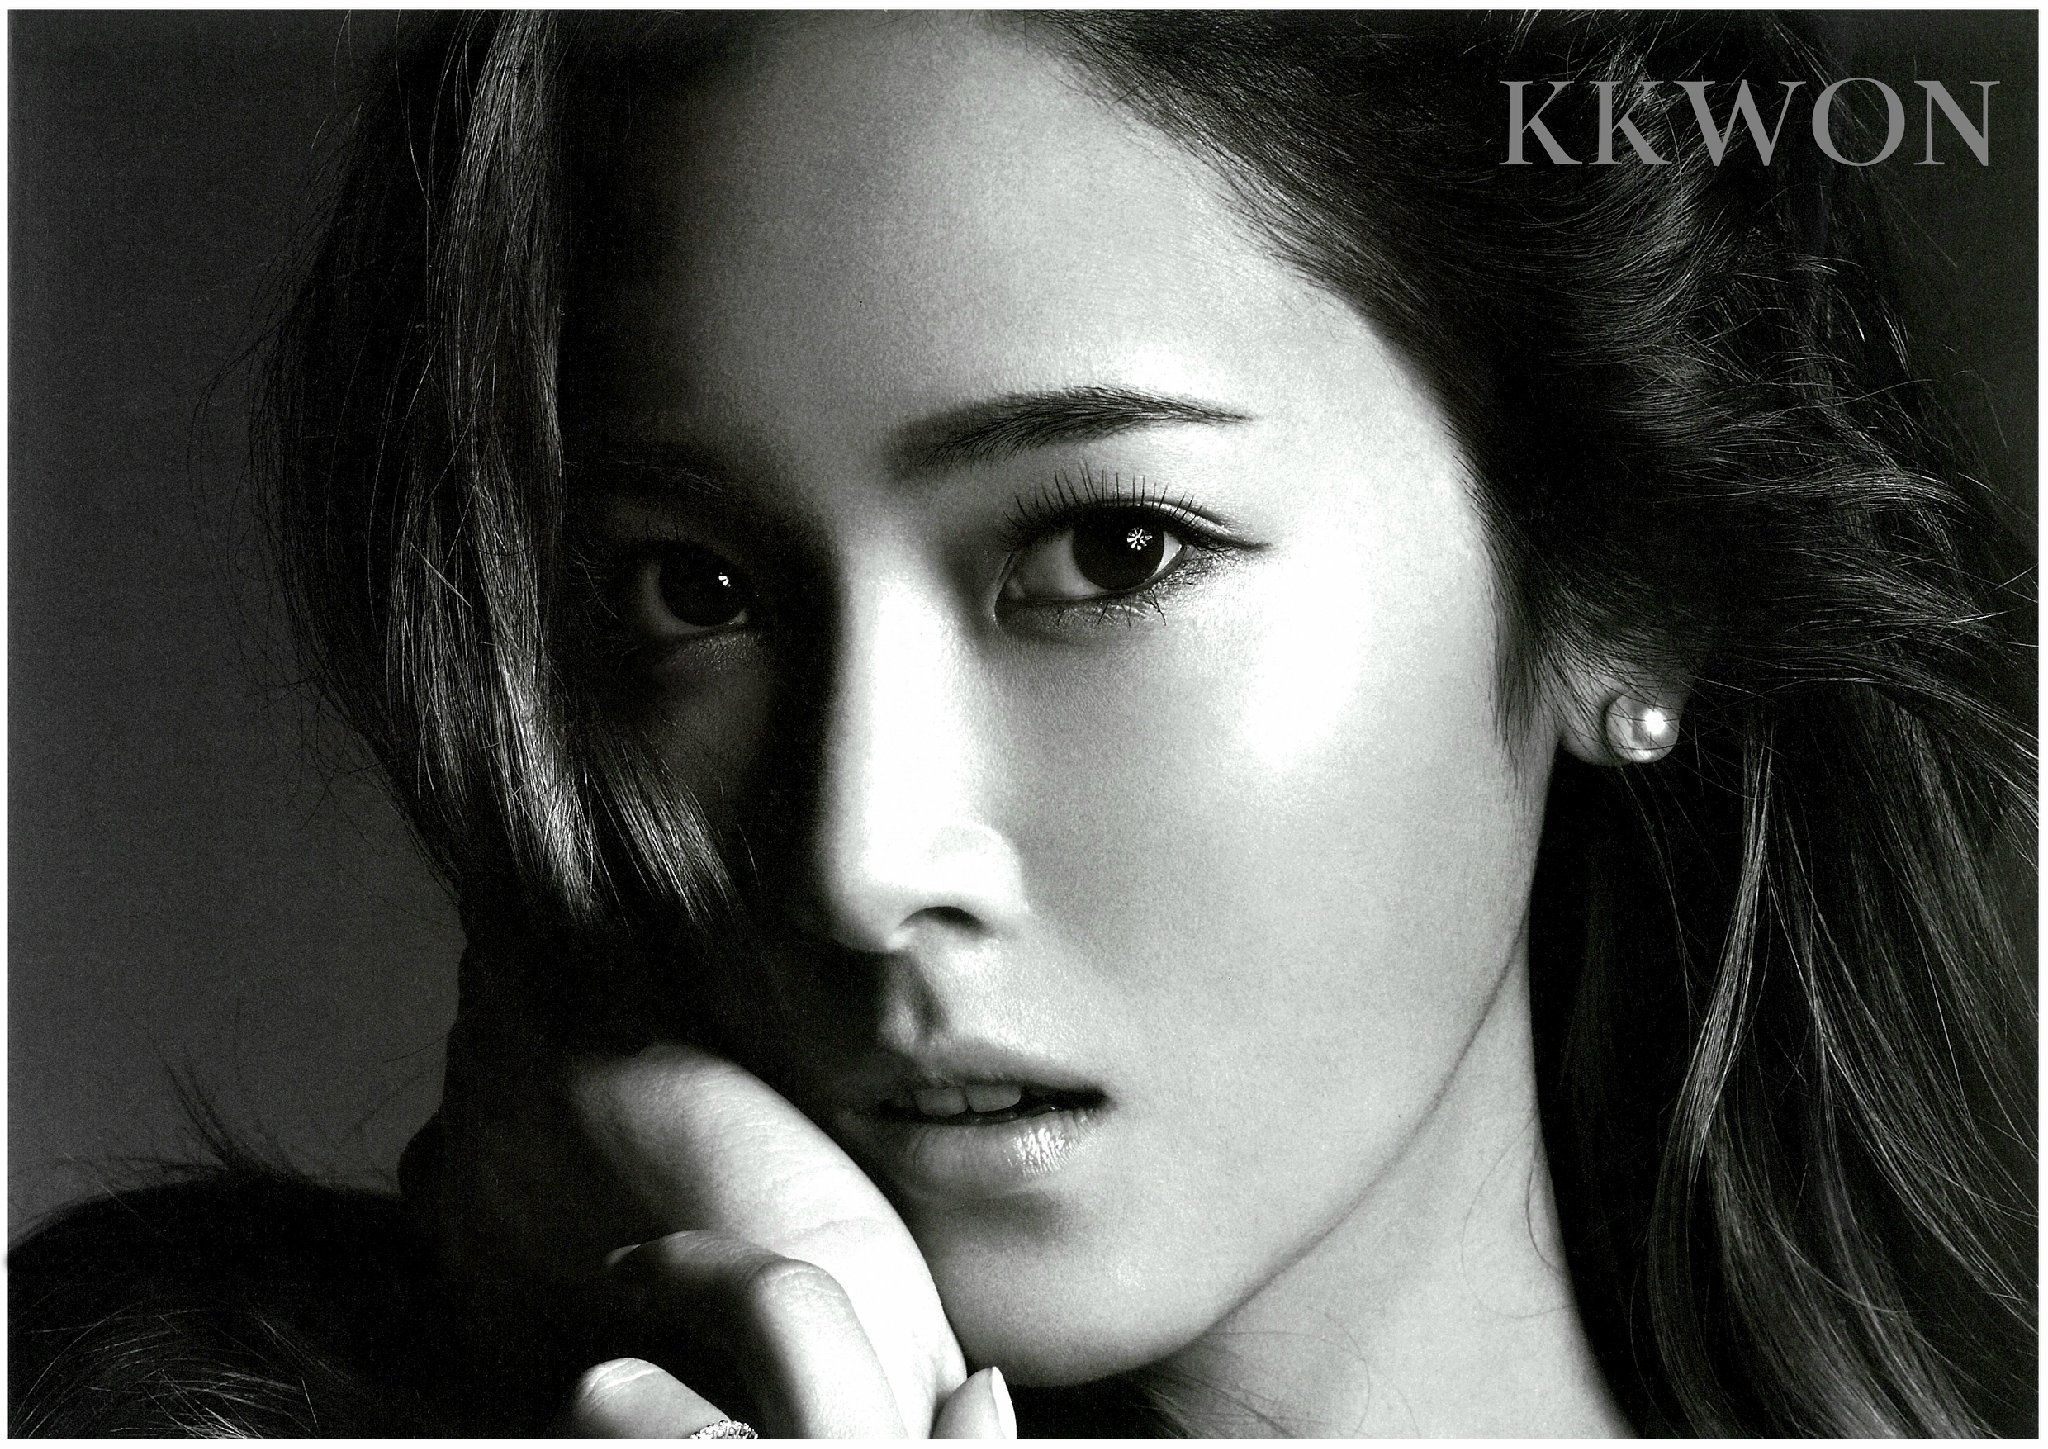 Jessica jung 2009